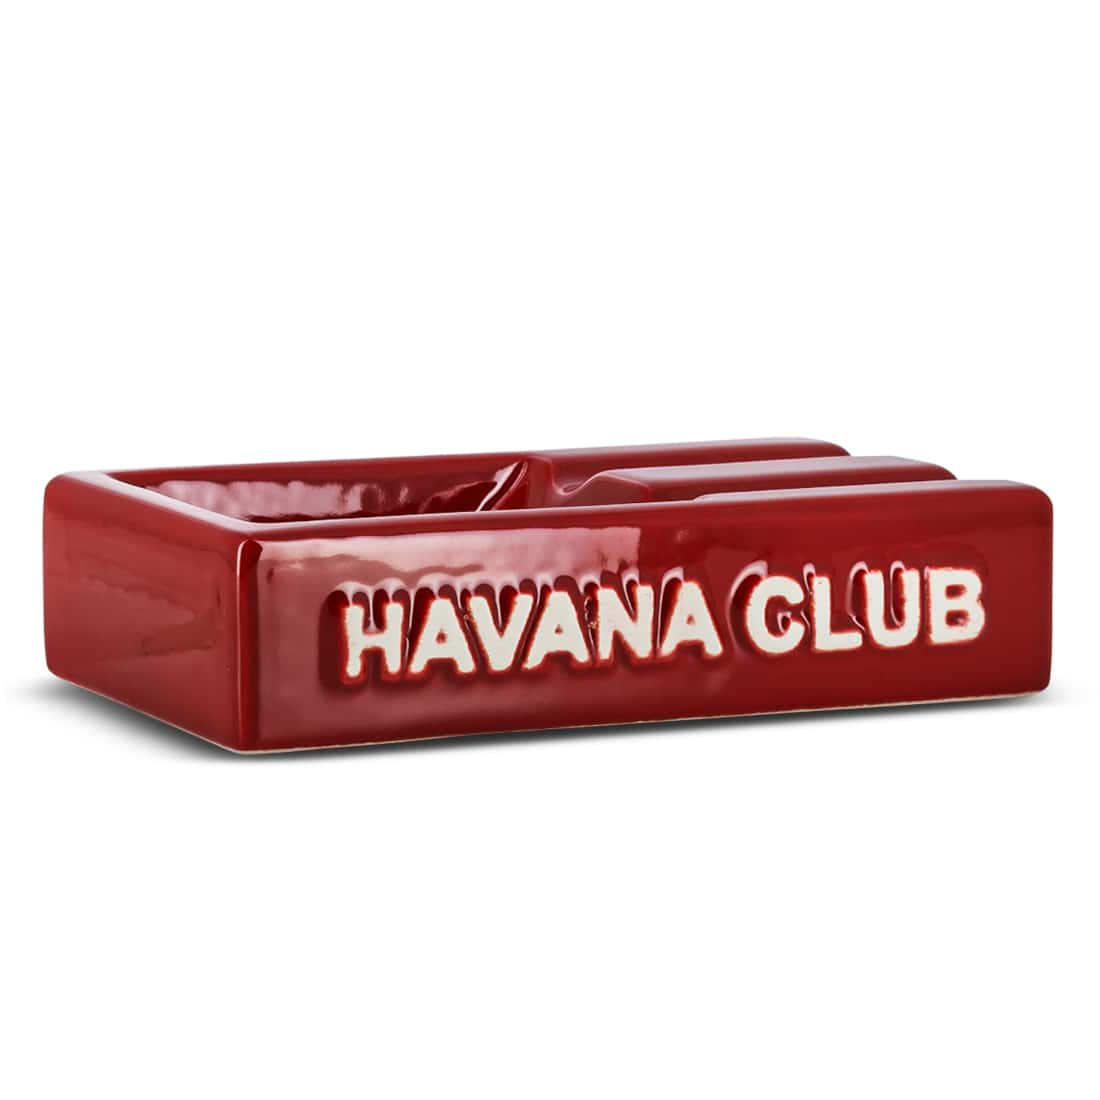 Photo de Cendrier Havana Club Rectangulaire El Segundo Rouge